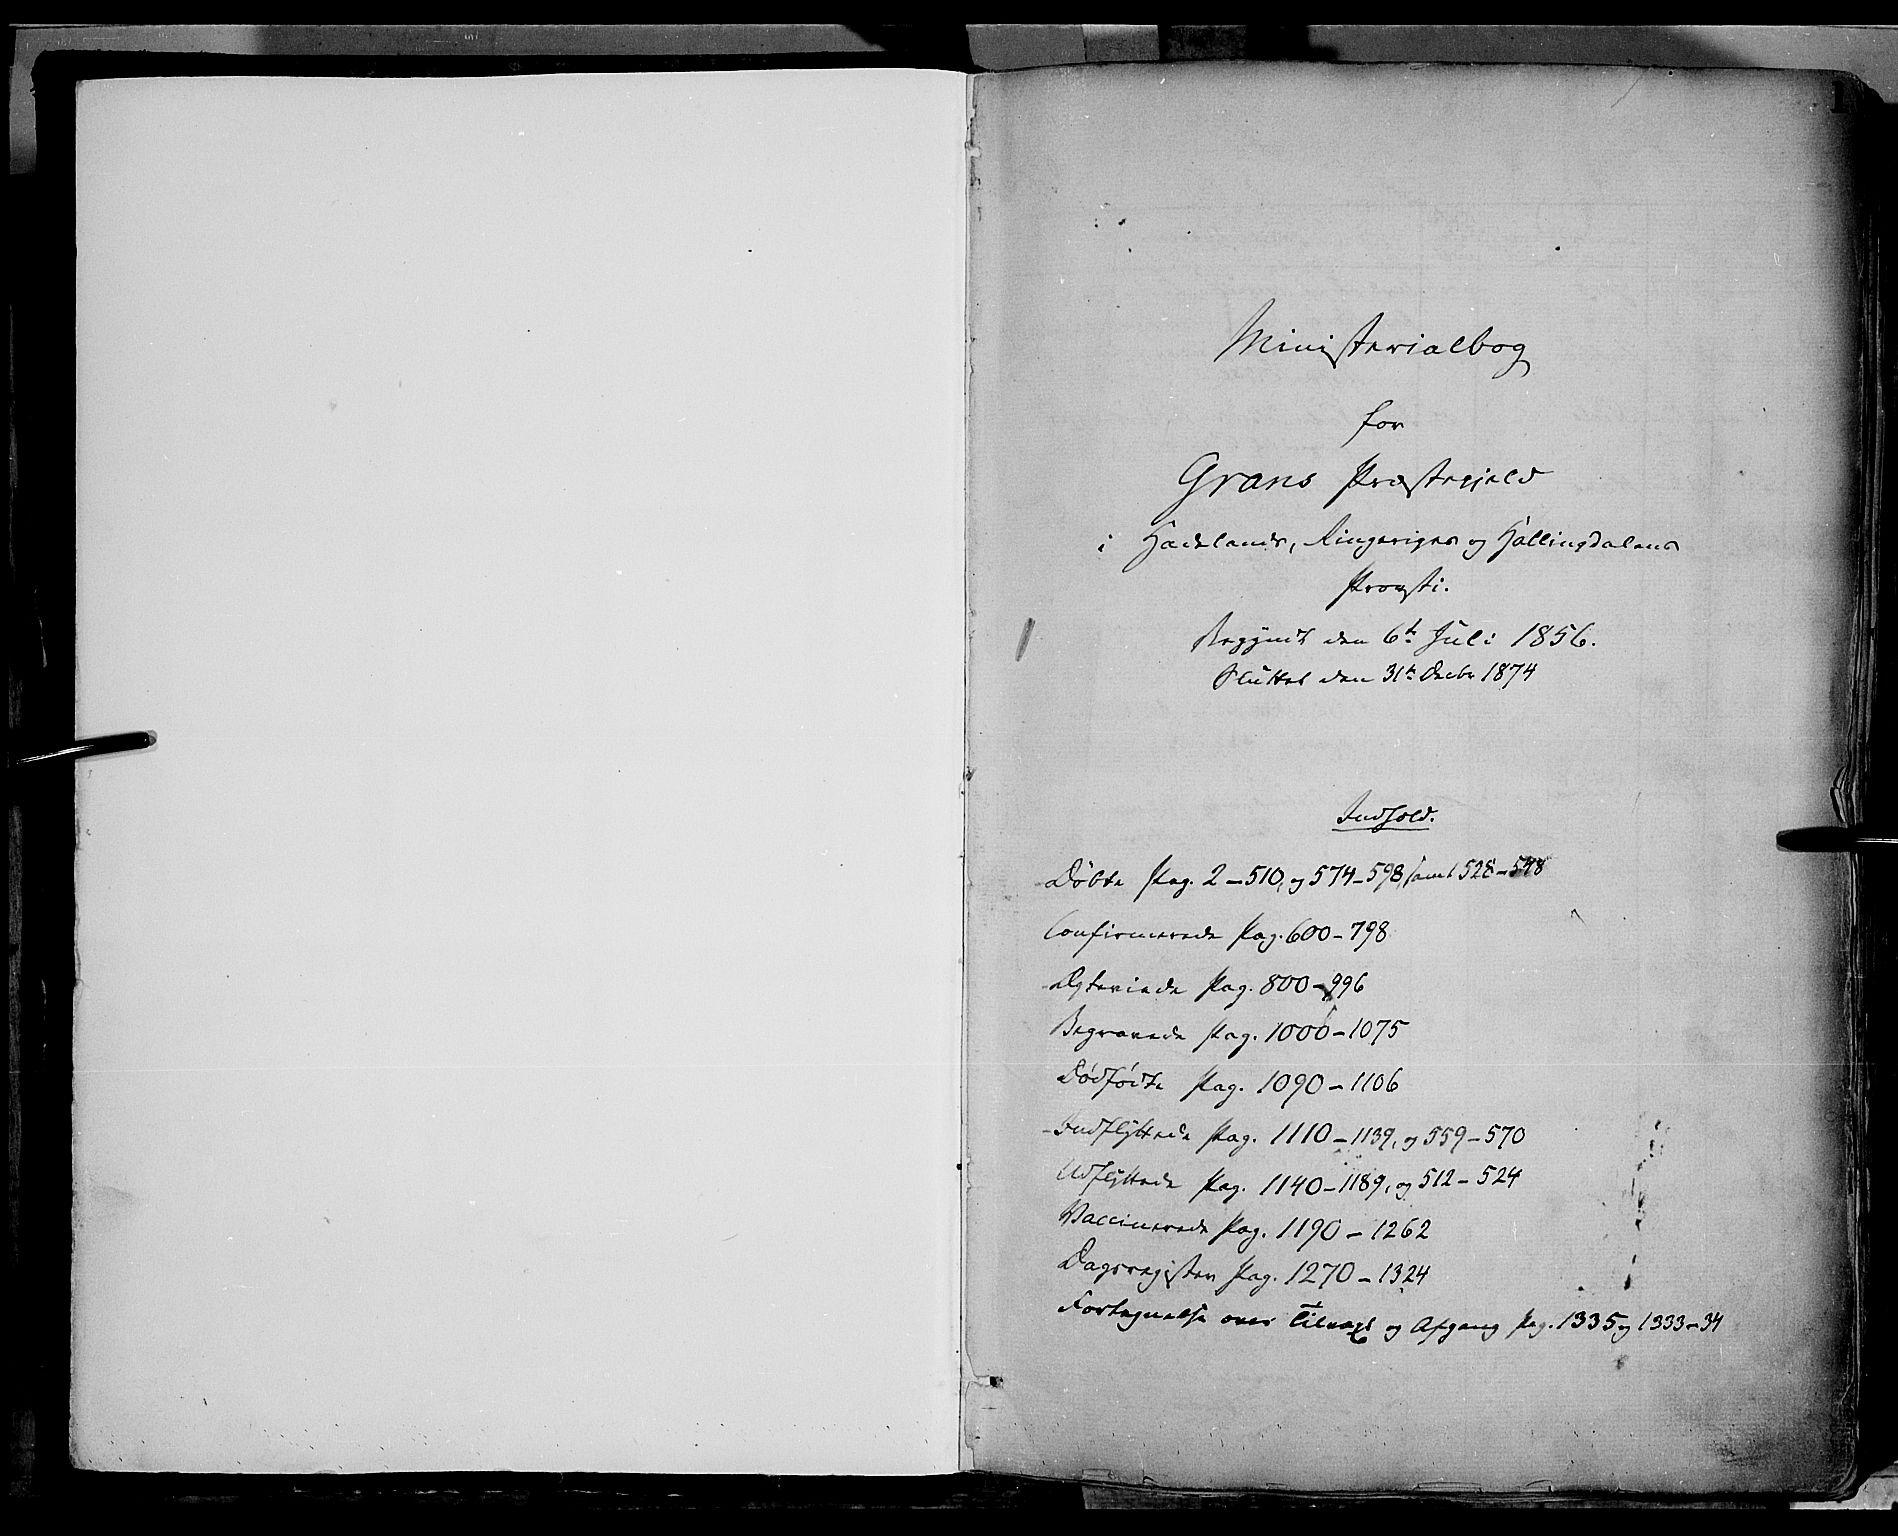 SAH, Gran prestekontor, Ministerialbok nr. 12, 1856-1874